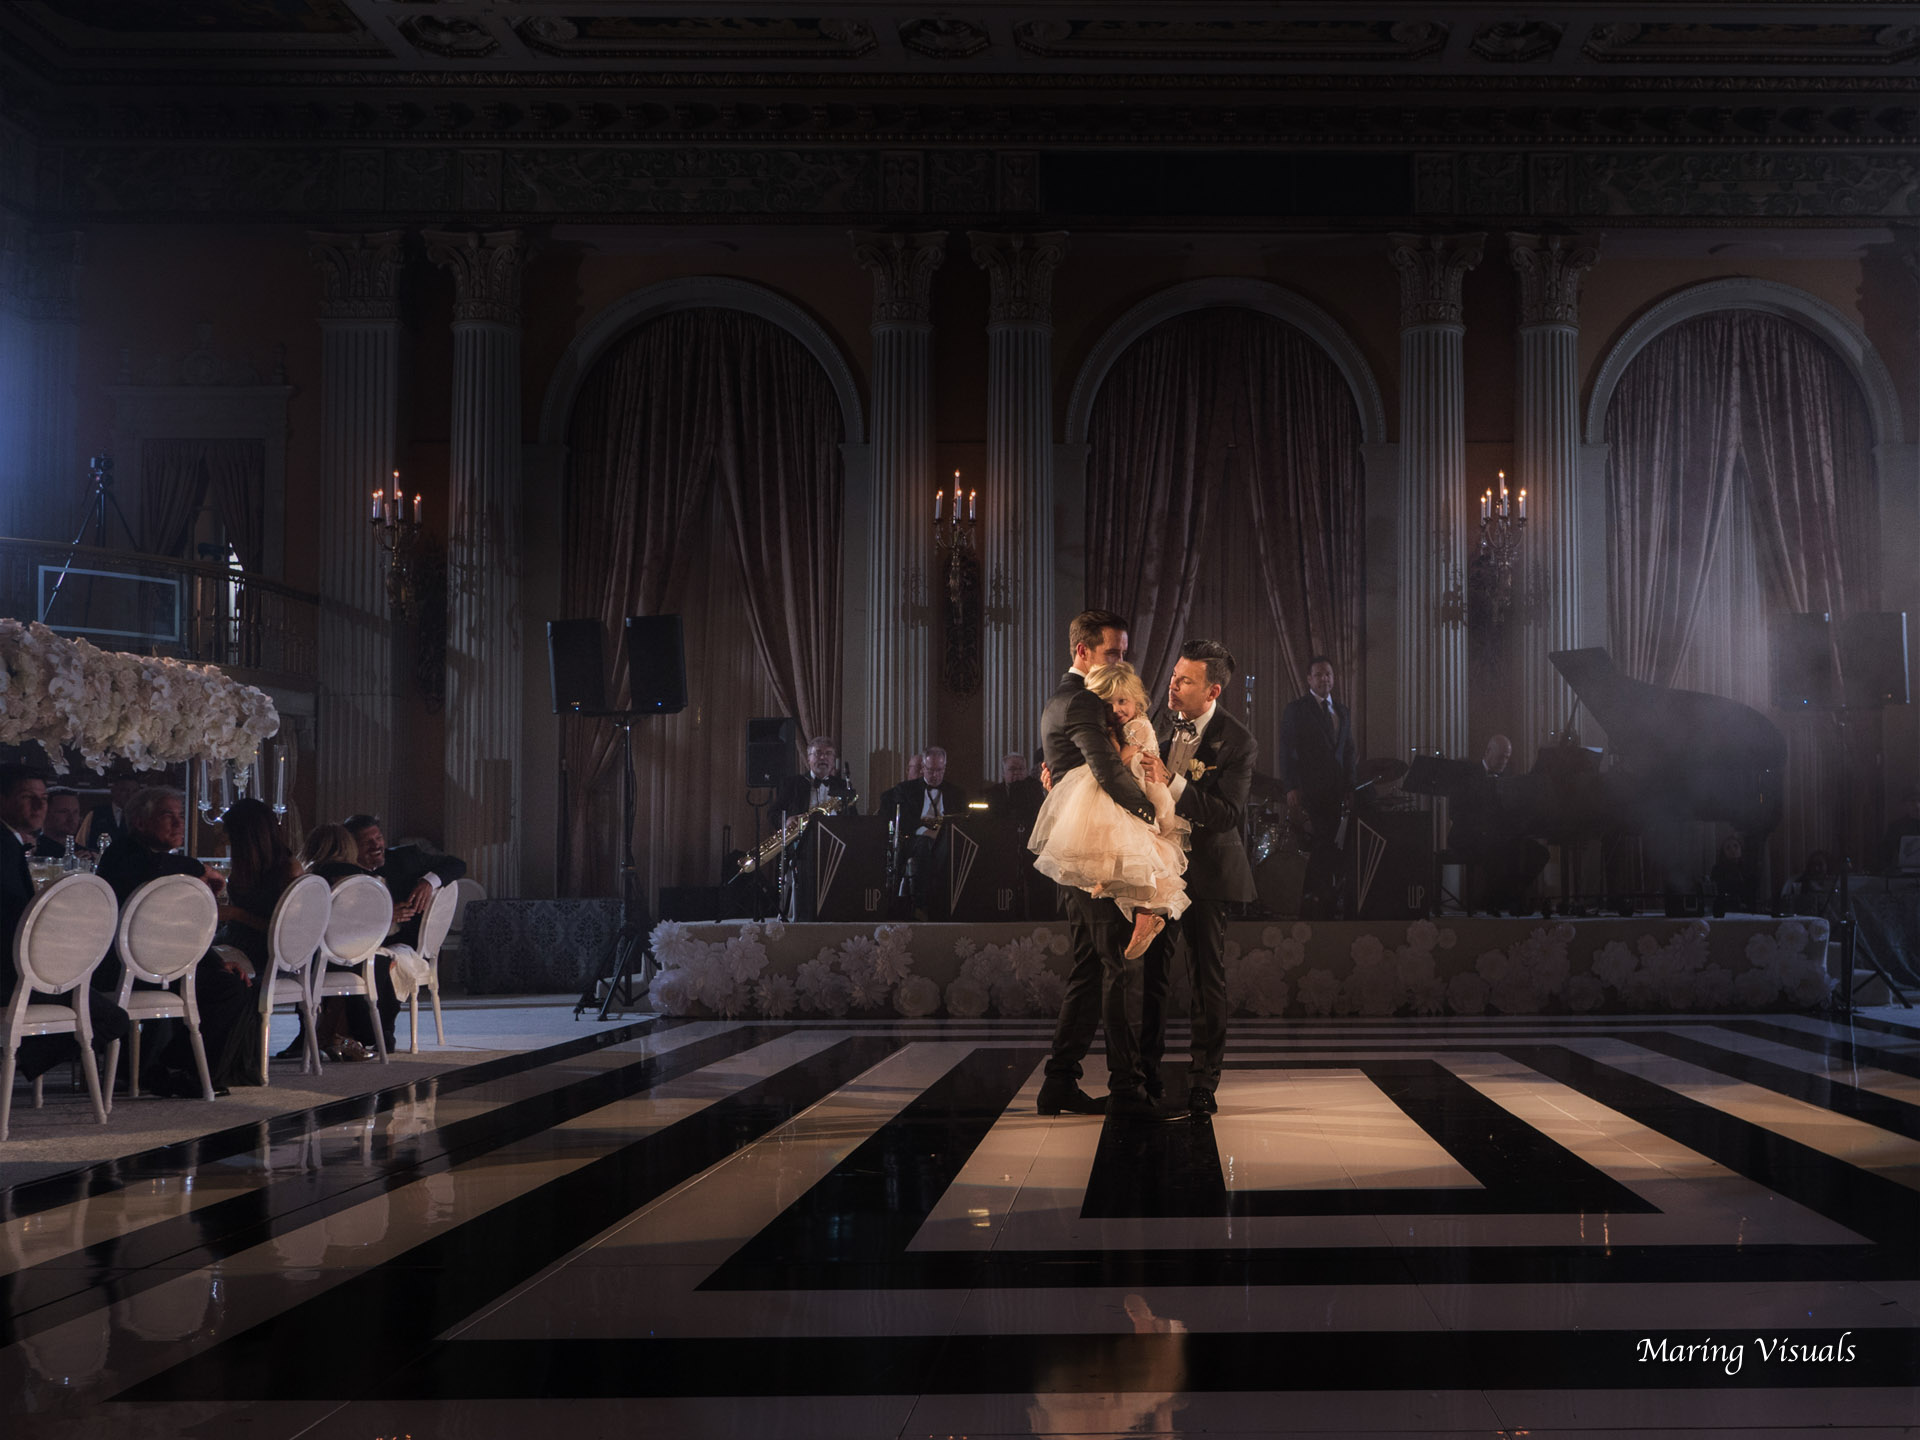 David Tutera Weddings by Maring Visuals 00561.jpg